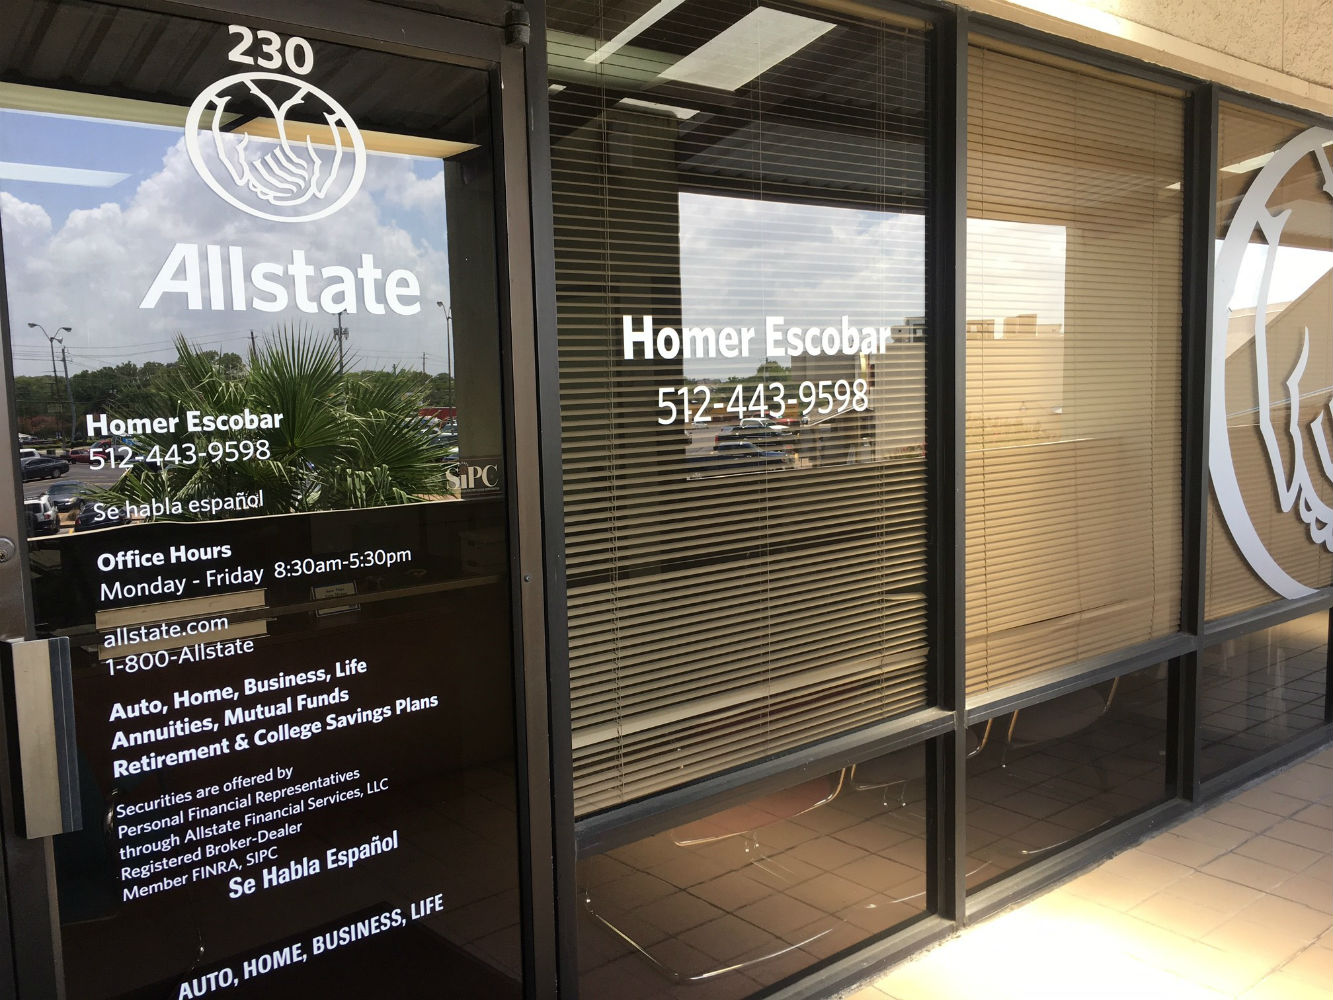 Homero Escobar: Allstate Insurance